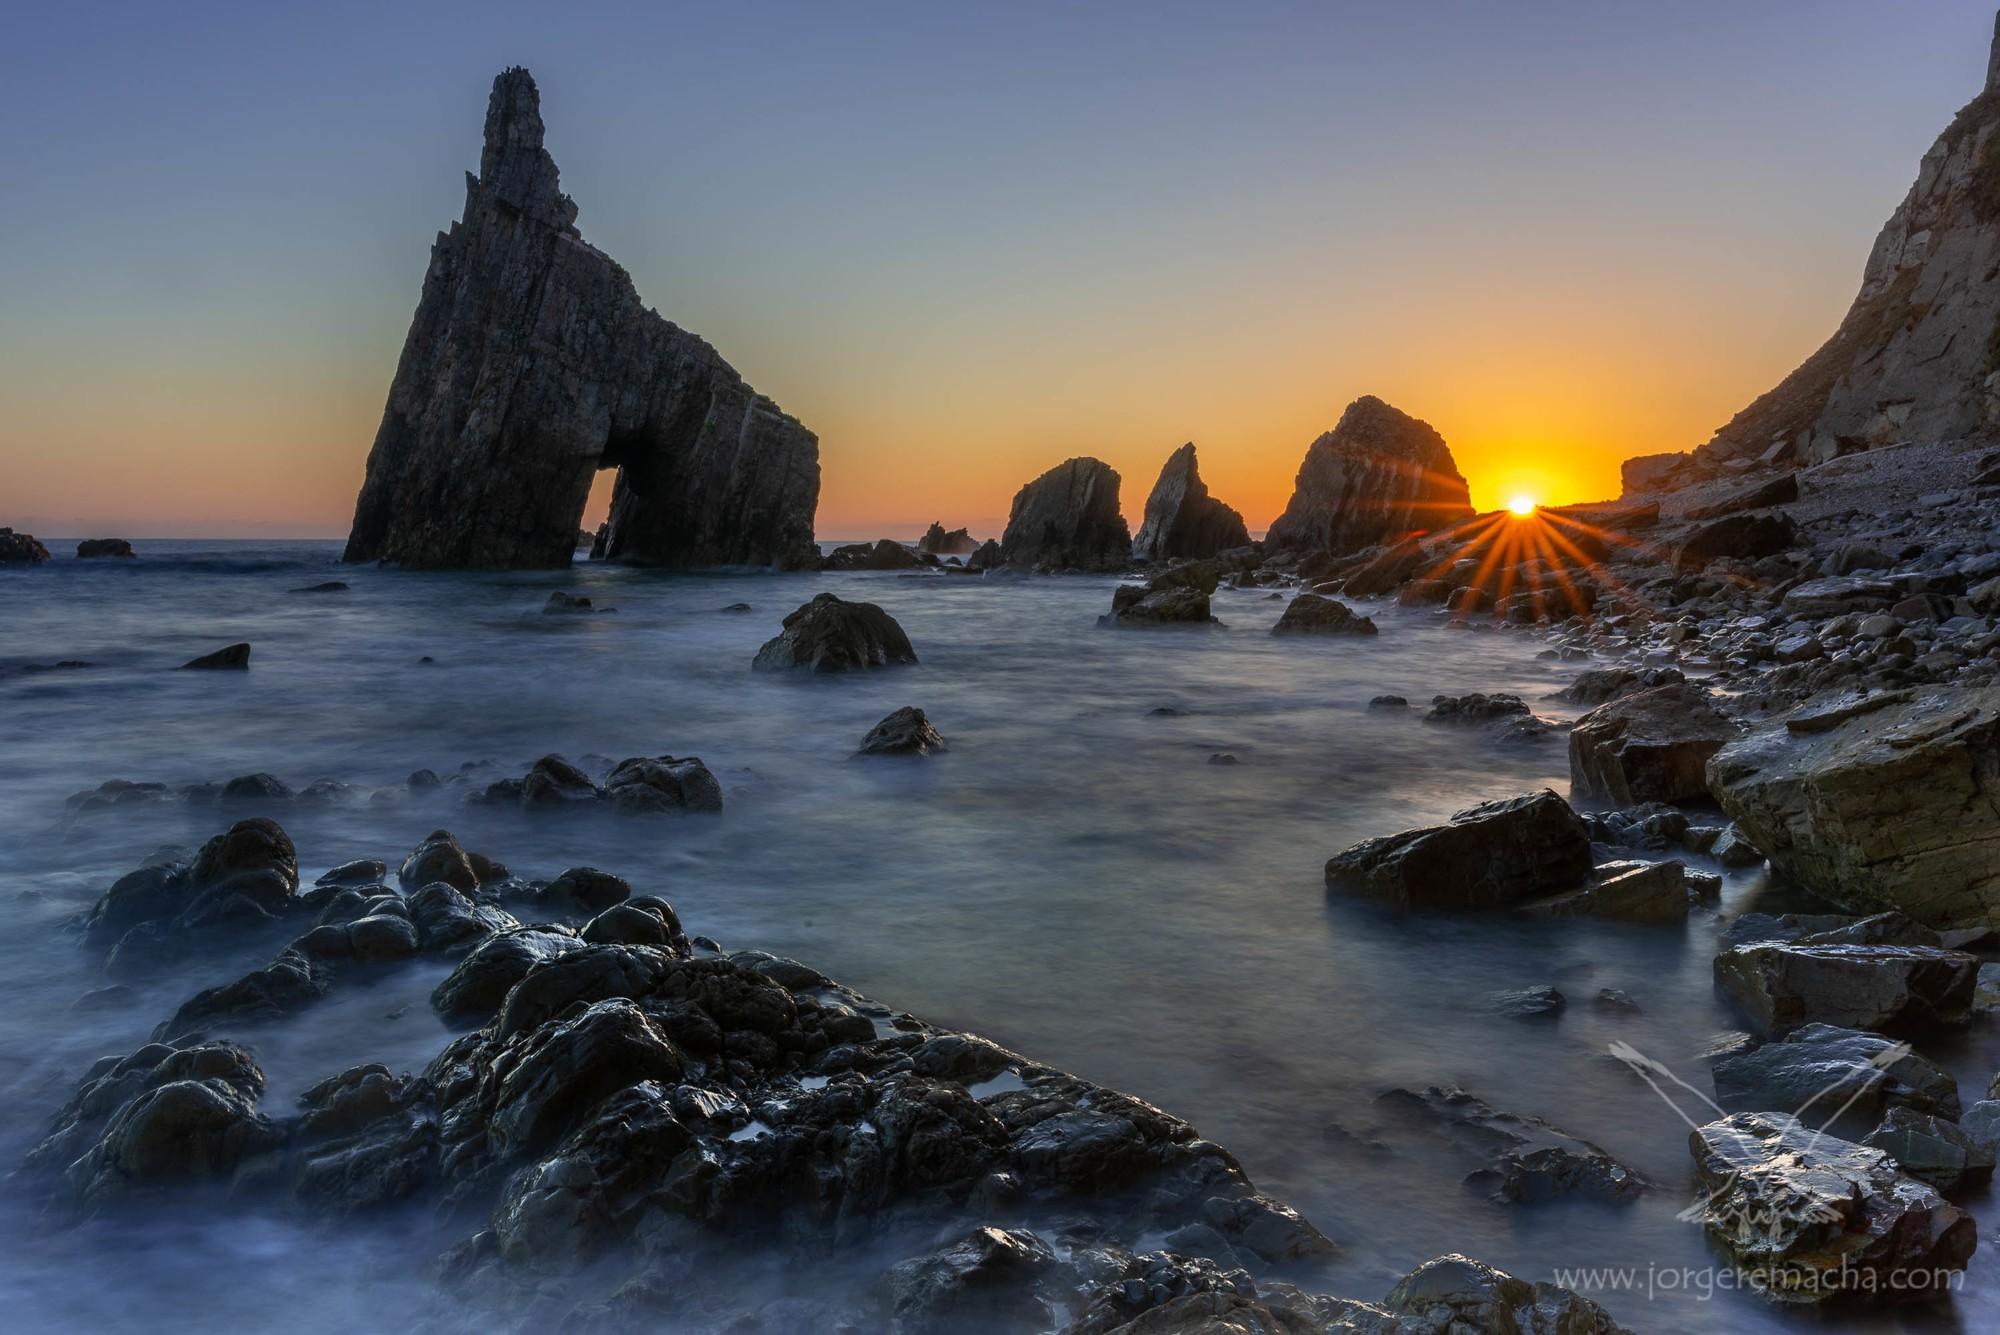 Costa de Cadavedo al amanecer con peña horadada